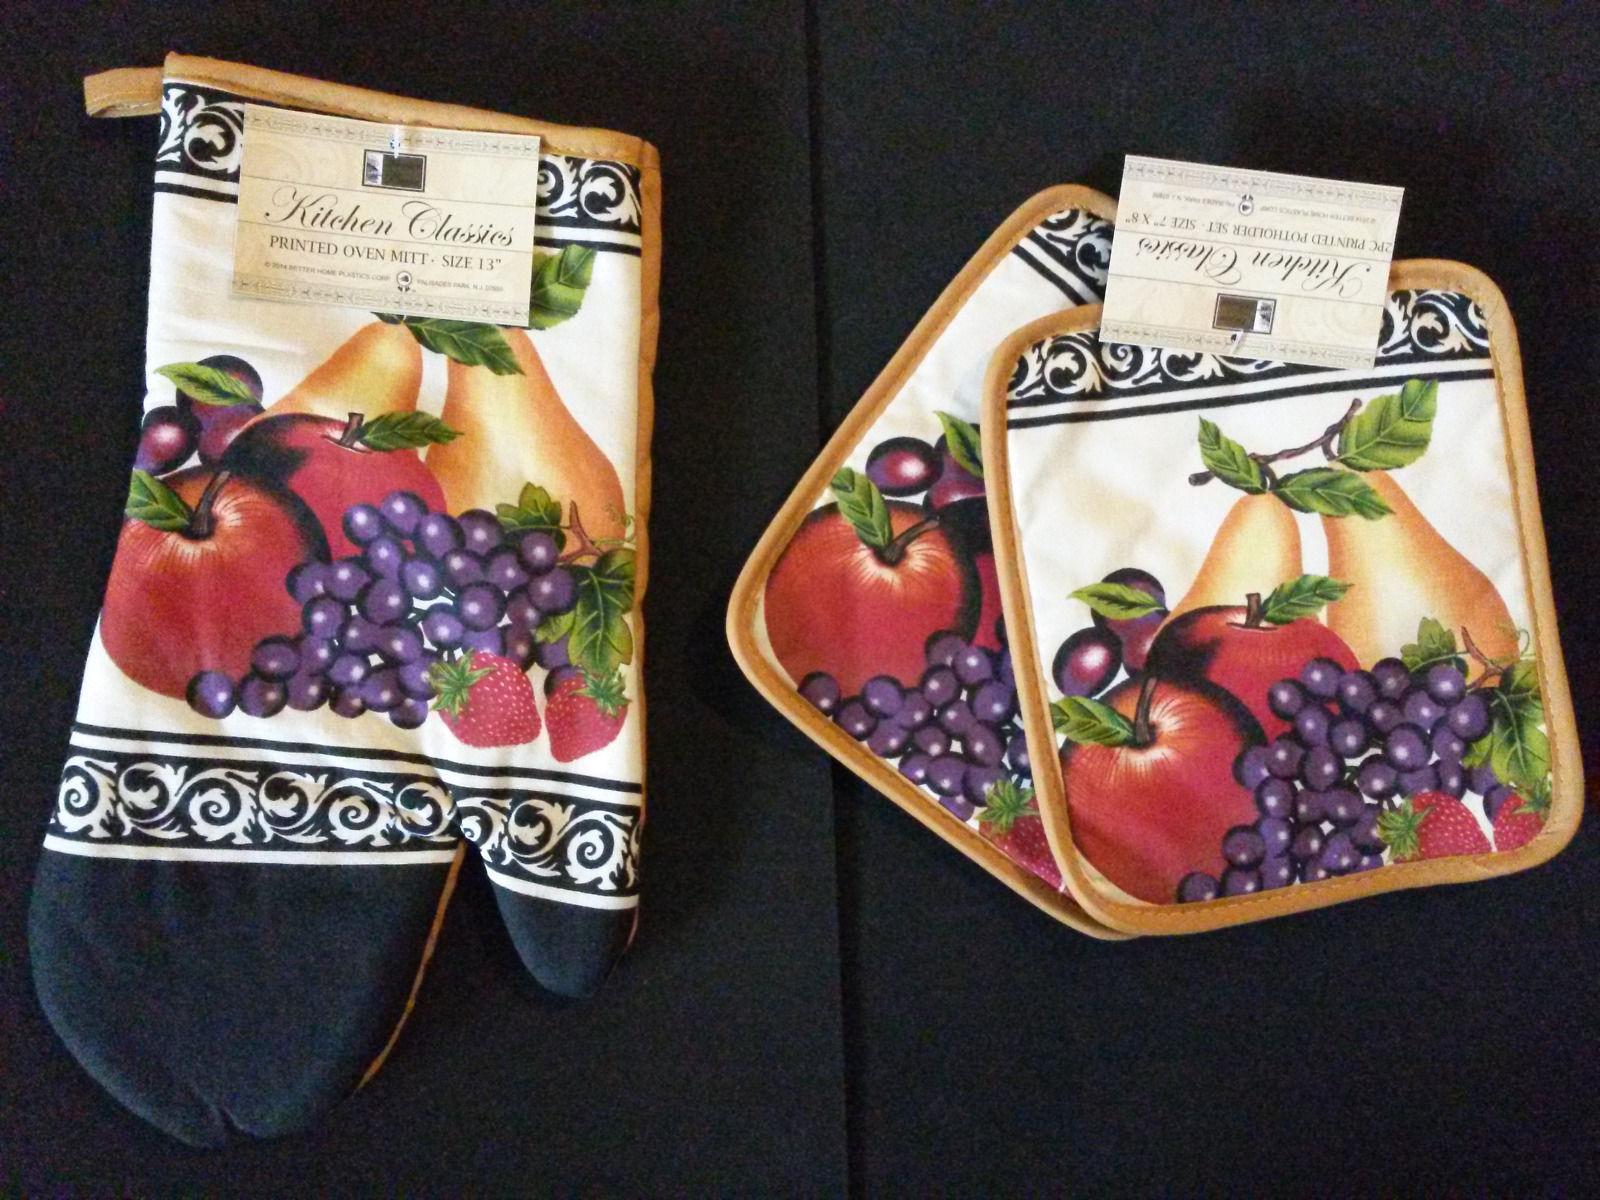 GRAPES /& PEARS 2 pc Printed Kitchen Set FRUITS 1 Pot Holder /& 1 Oven Mitt